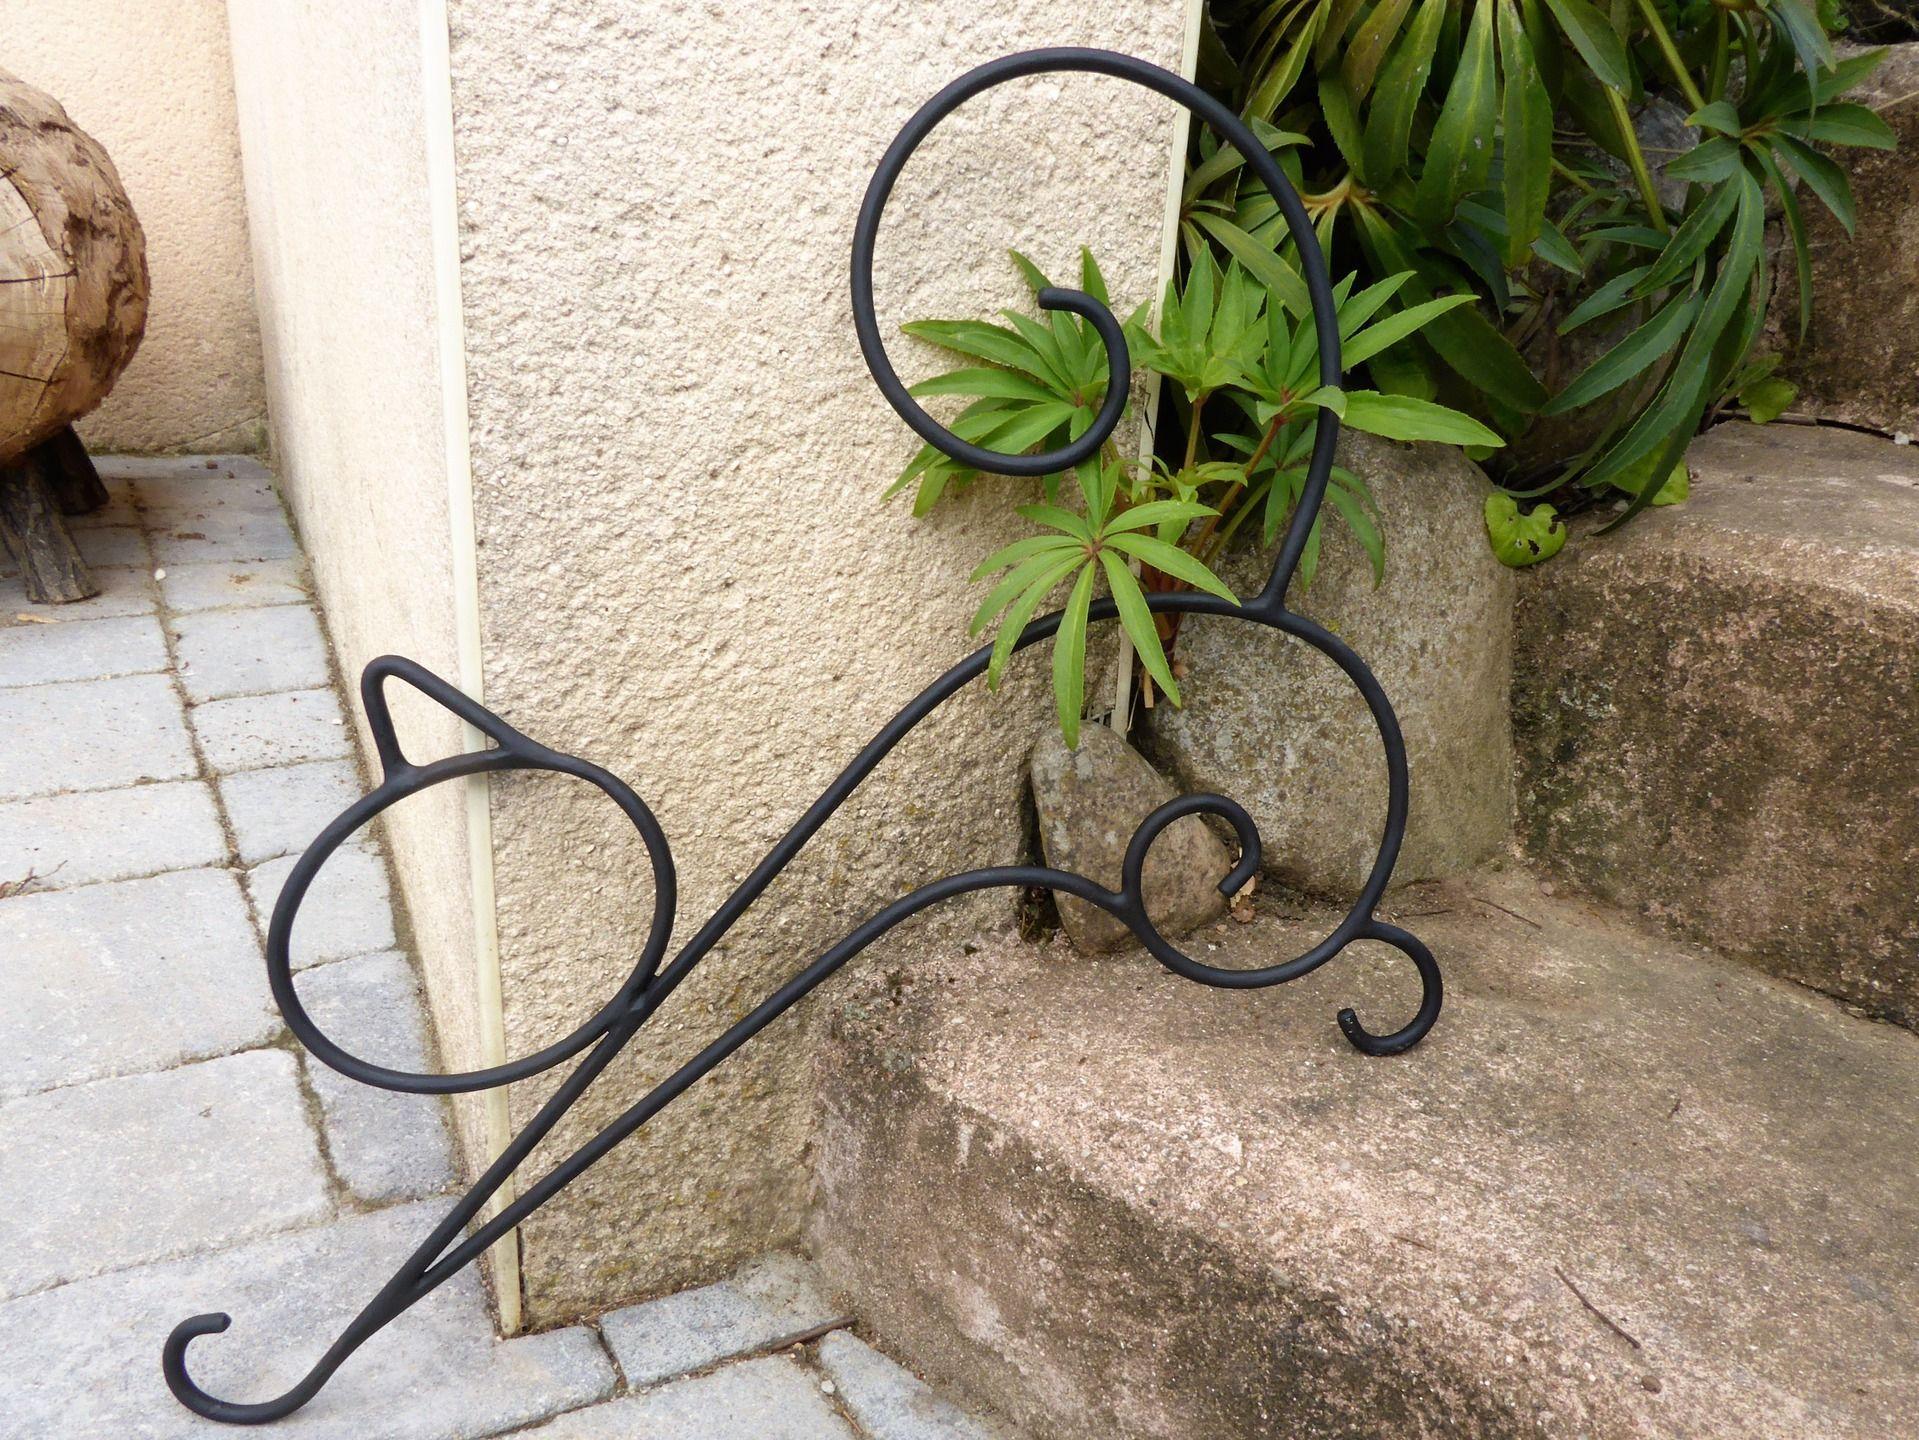 pin by pepsettop jardin en valaille on d coration d 39 int rieur en fer forg pinterest steel. Black Bedroom Furniture Sets. Home Design Ideas